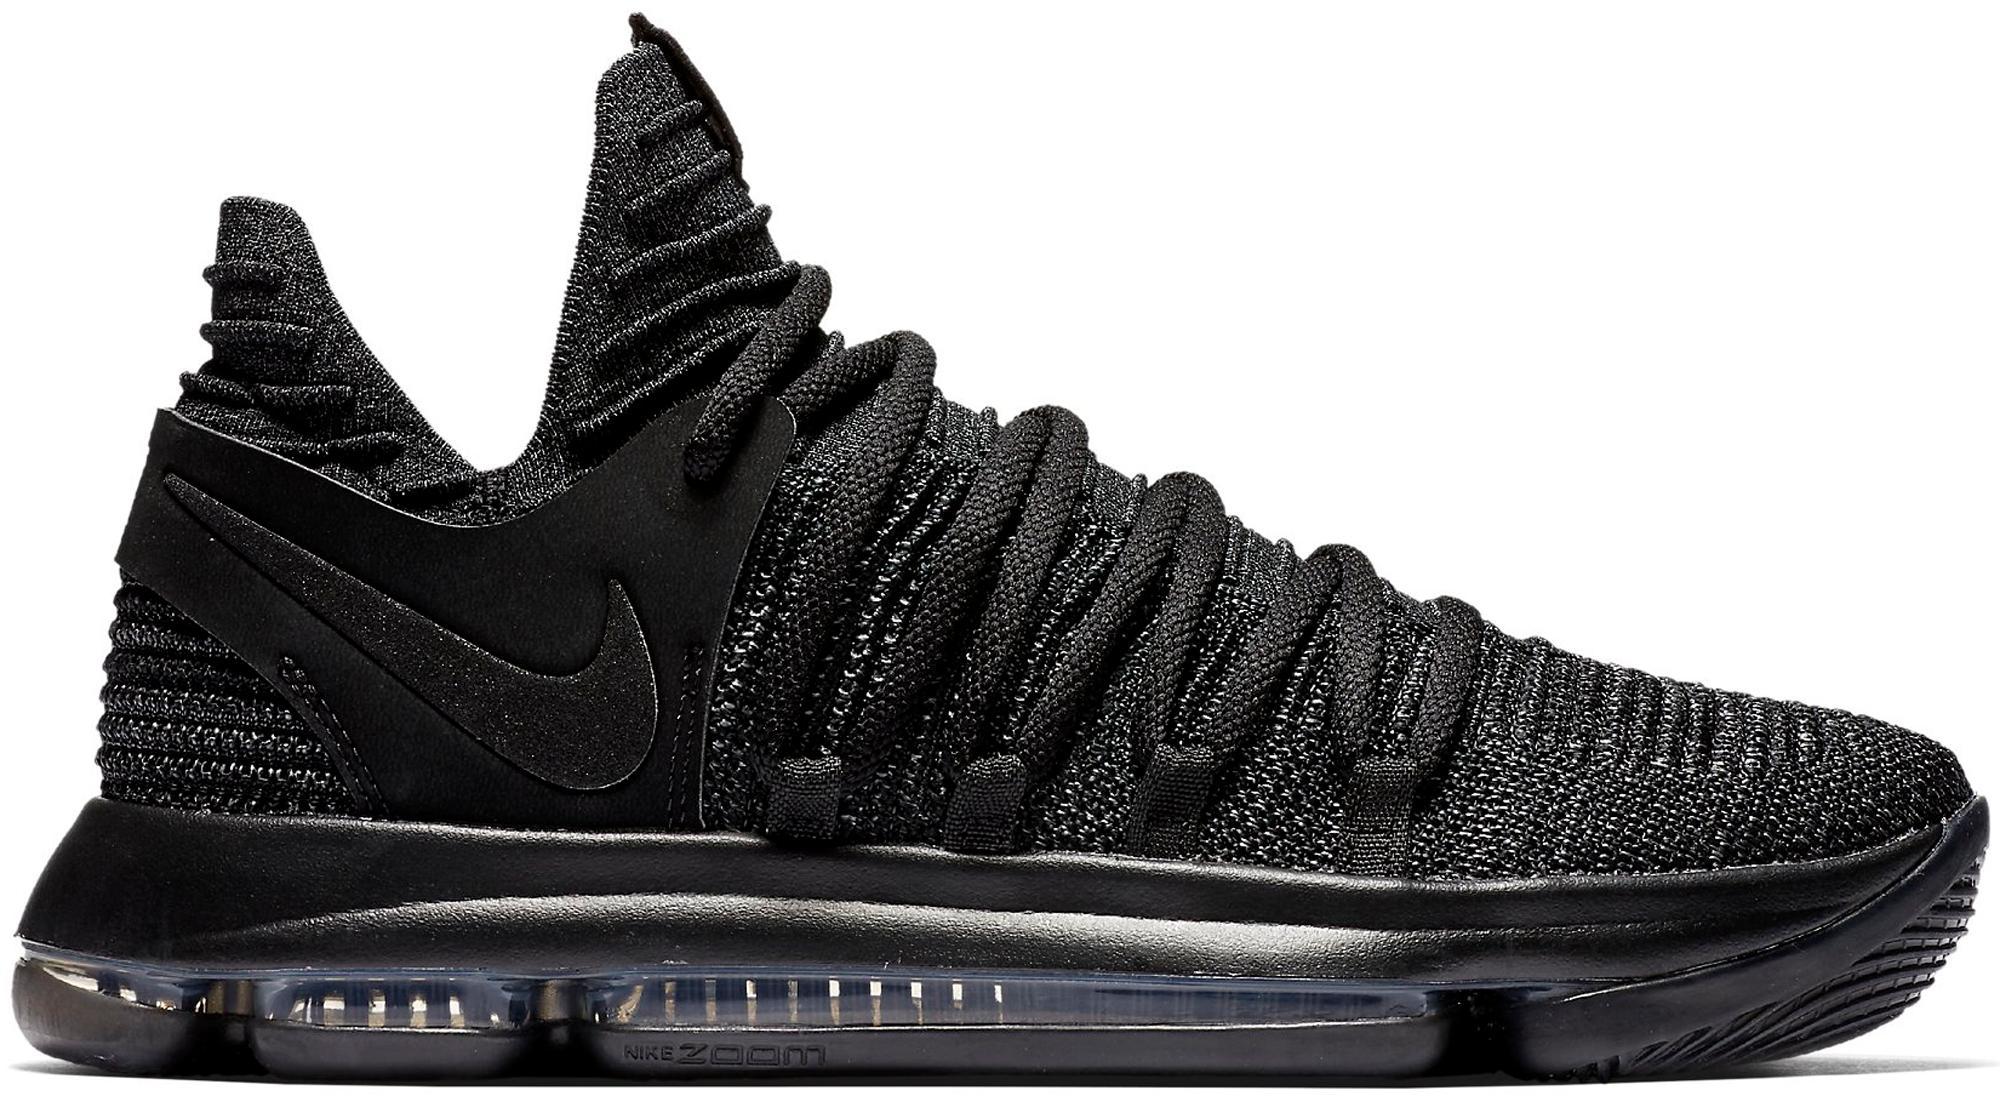 hot sales e83ea 69cdc Nike KD 10 Blackout - StockX News